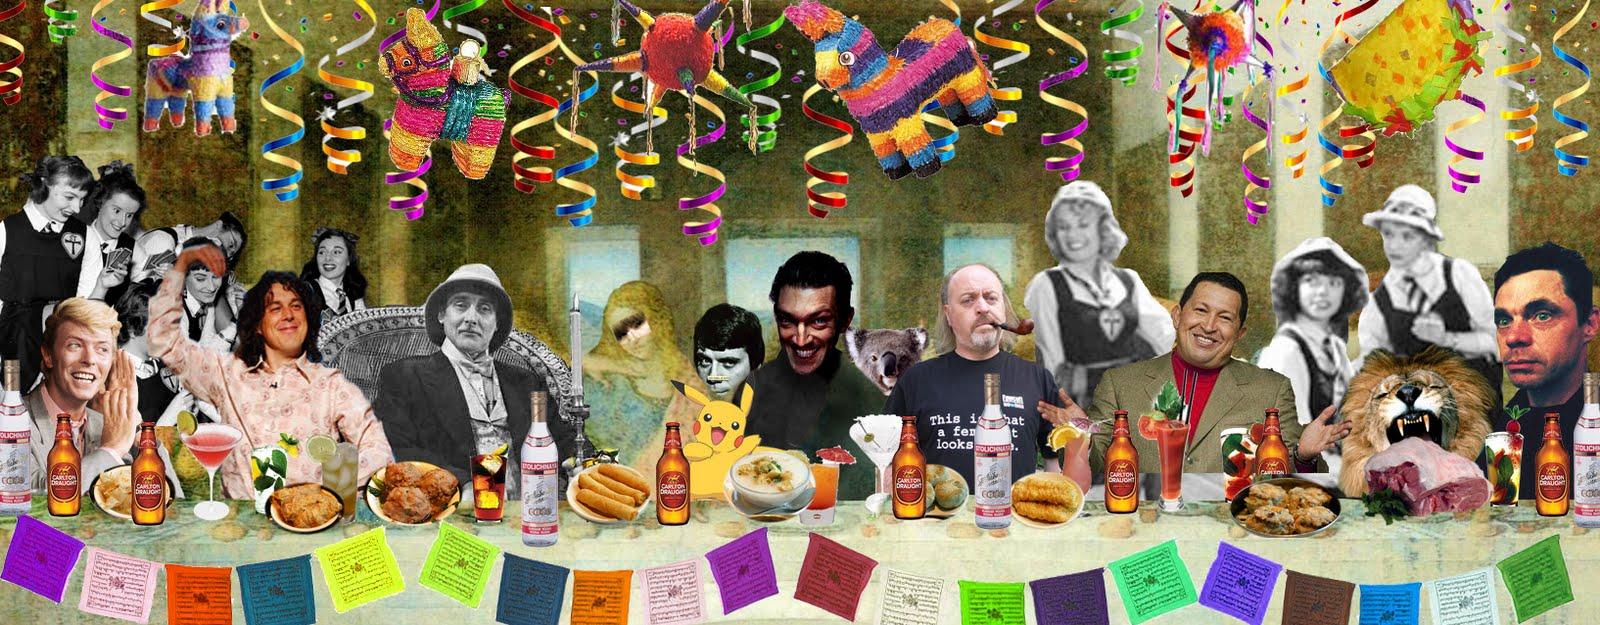 Clip Art Dinner Party Clipart - Clipart Kid